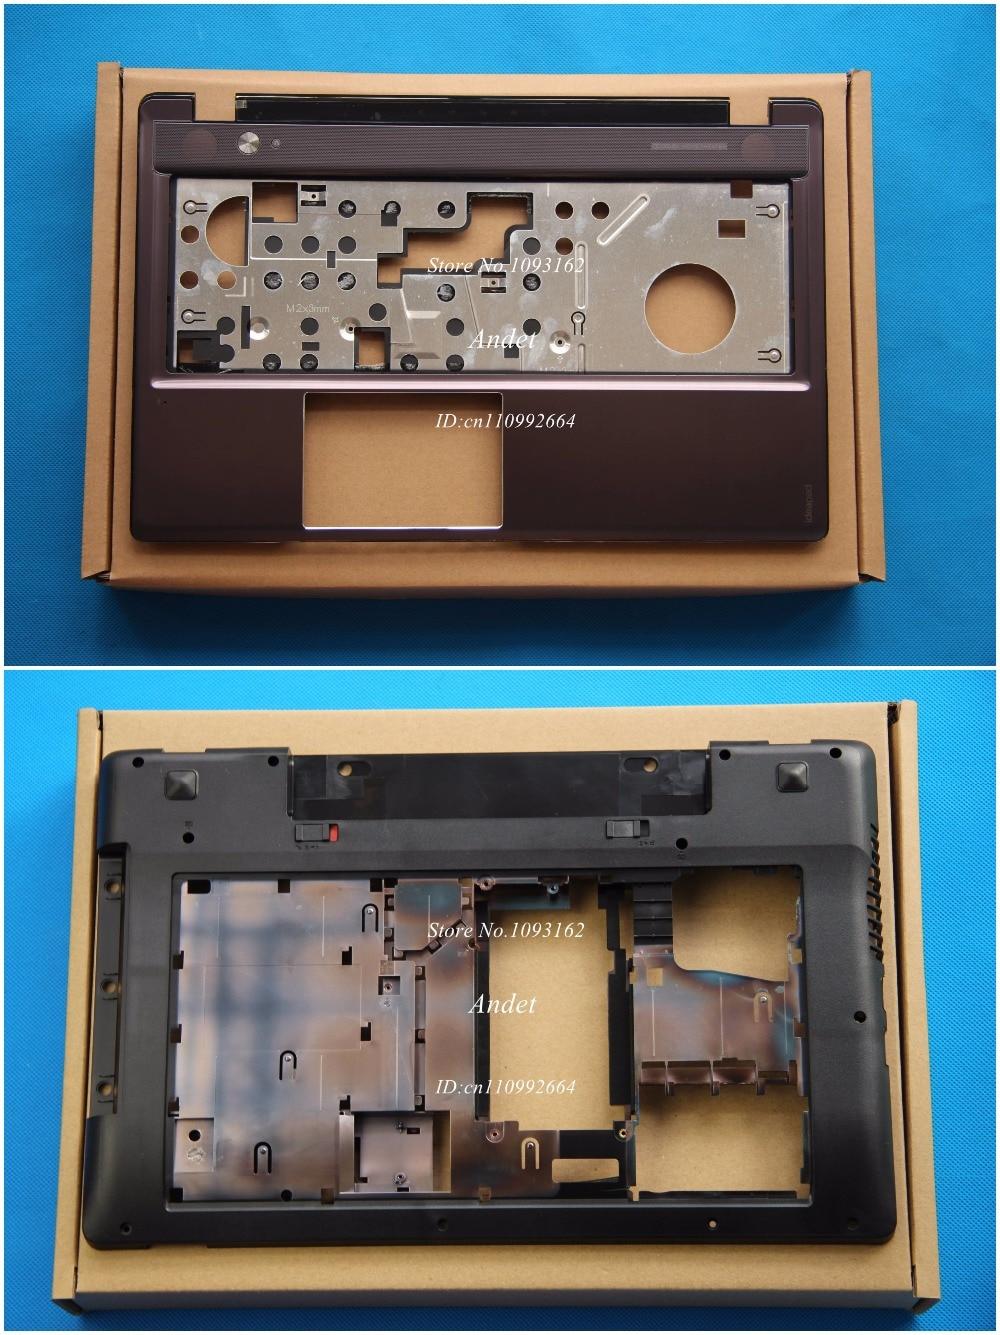 New Original For Lenovo IdeaPad Z580 Z585 Back Cover Base Shell Bottom Case Black Color 3ALZ3BALV00 &Palmrest Keyboar CoverNew Original For Lenovo IdeaPad Z580 Z585 Back Cover Base Shell Bottom Case Black Color 3ALZ3BALV00 &Palmrest Keyboar Cover